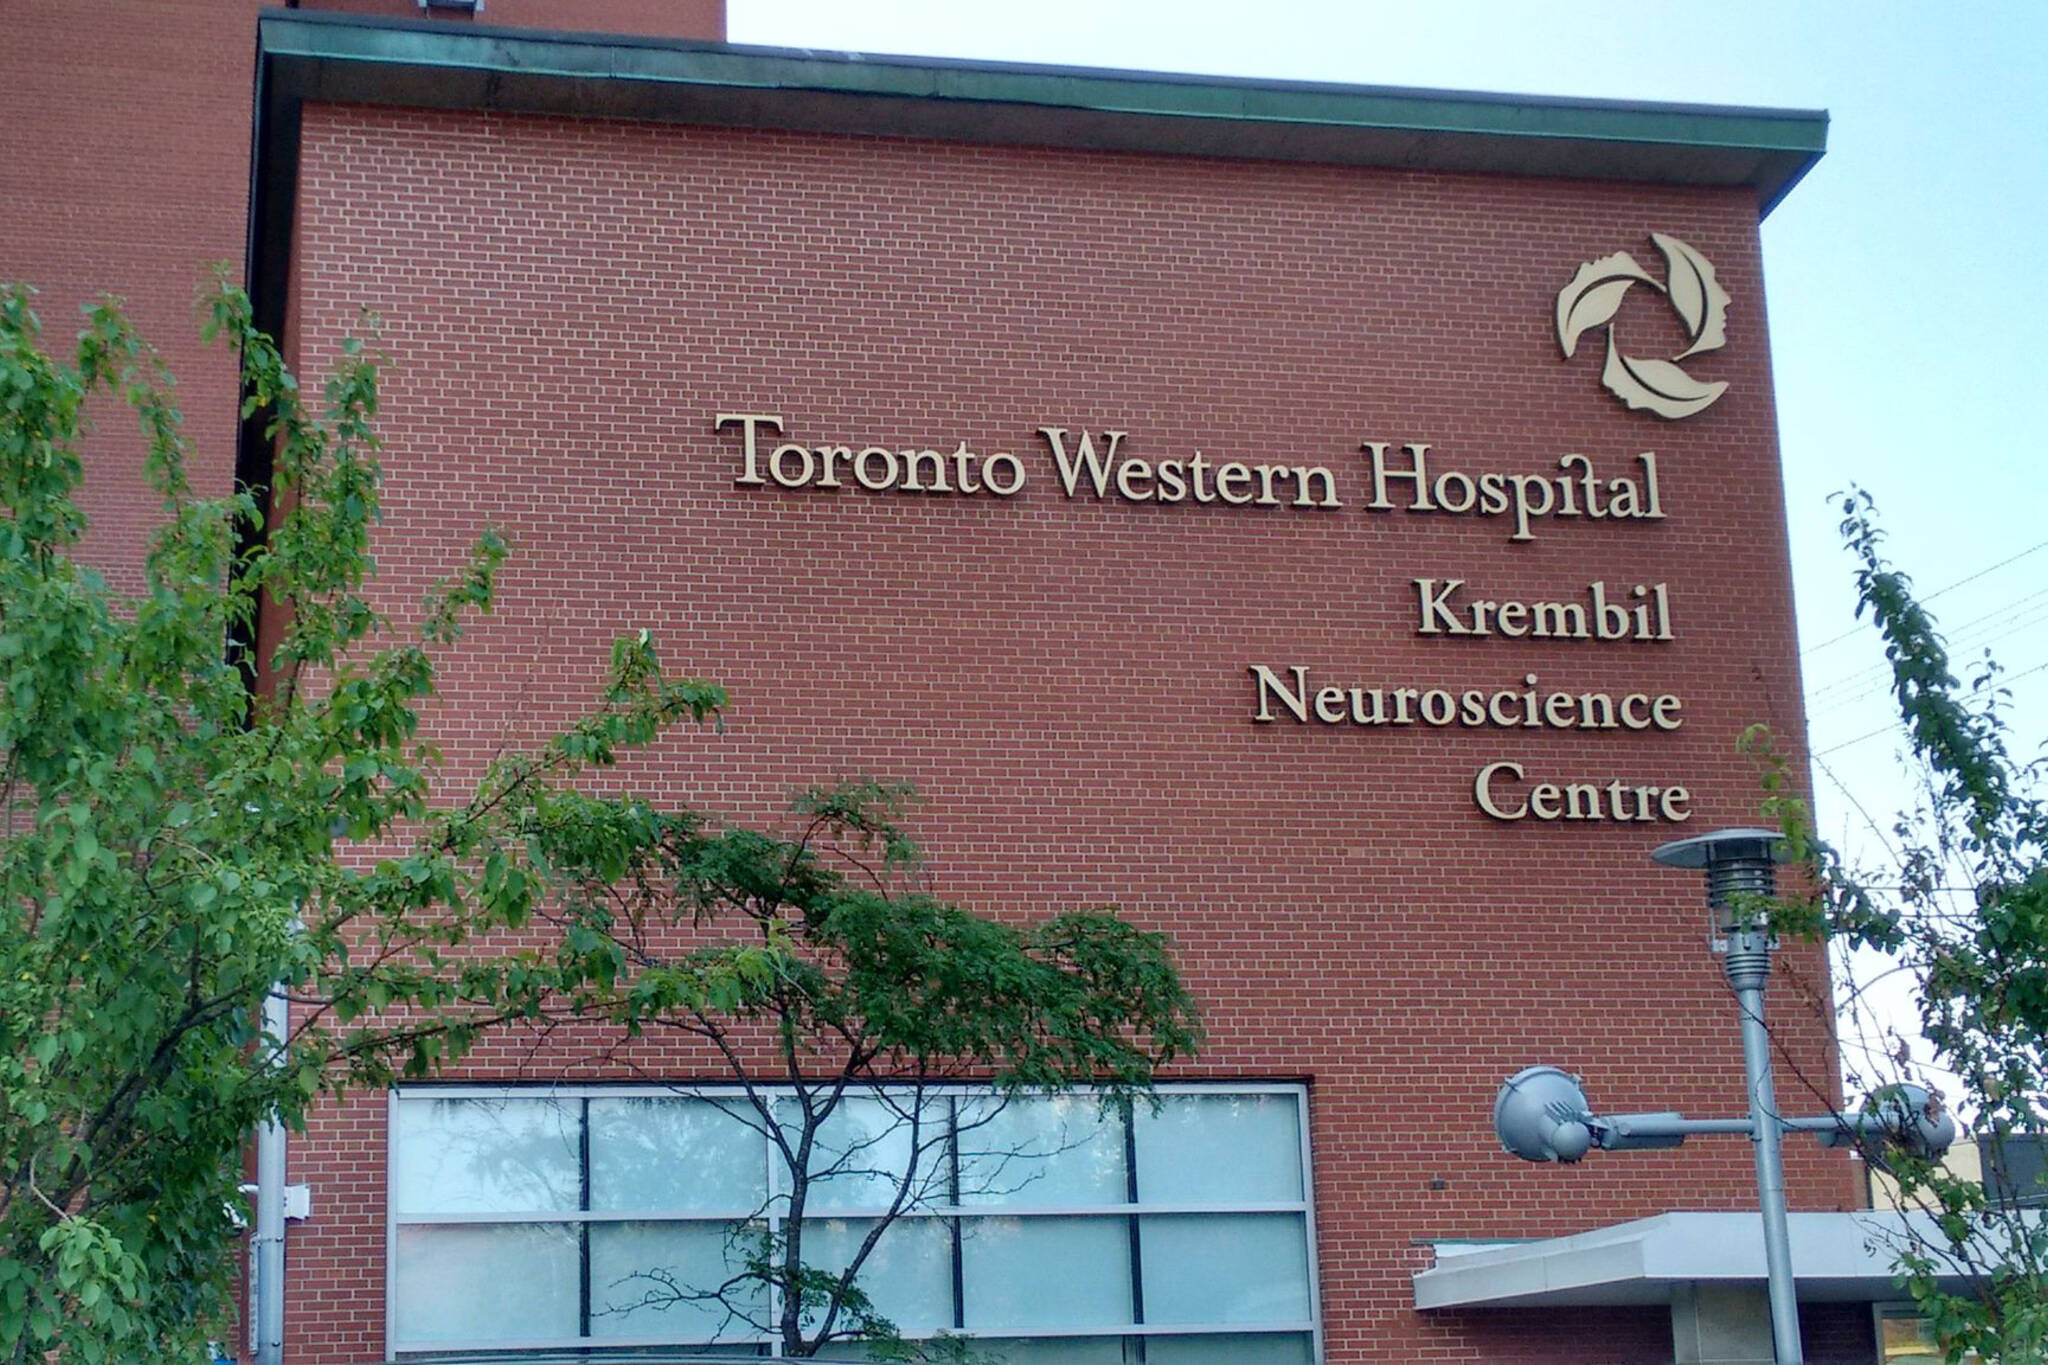 toronto western hospital parking